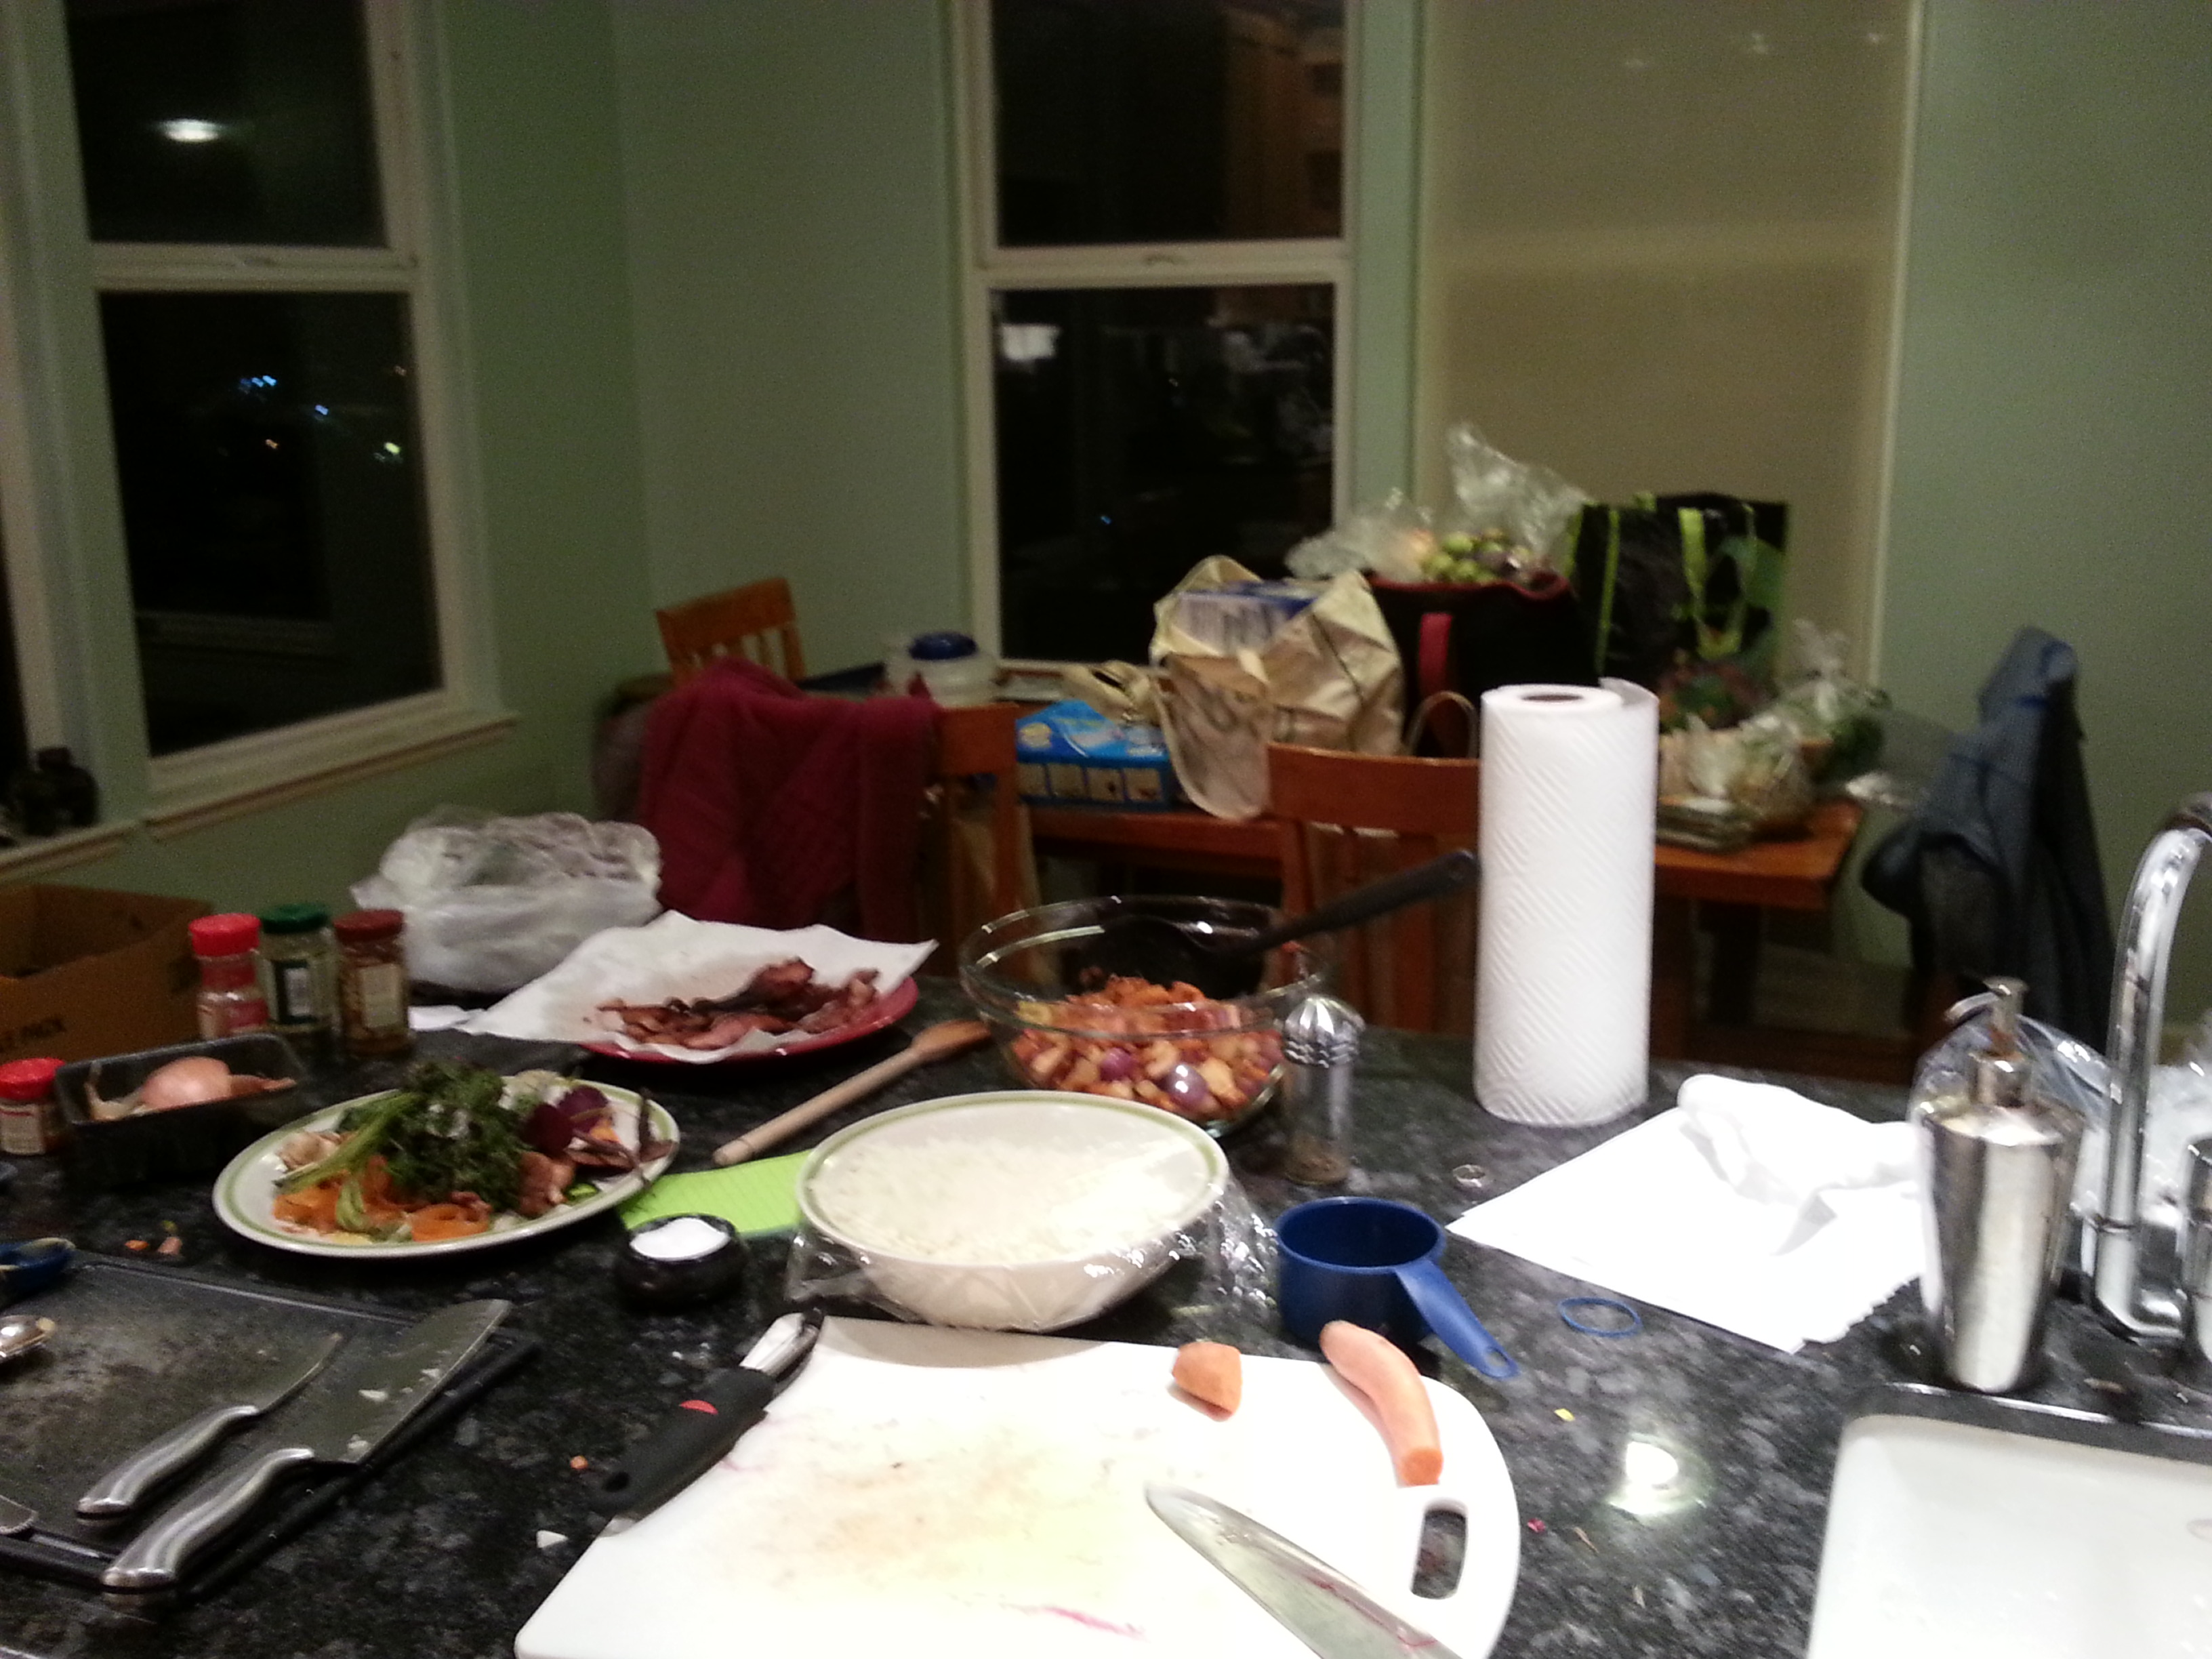 A kitchen full of fresh veggies? A beautiful thing